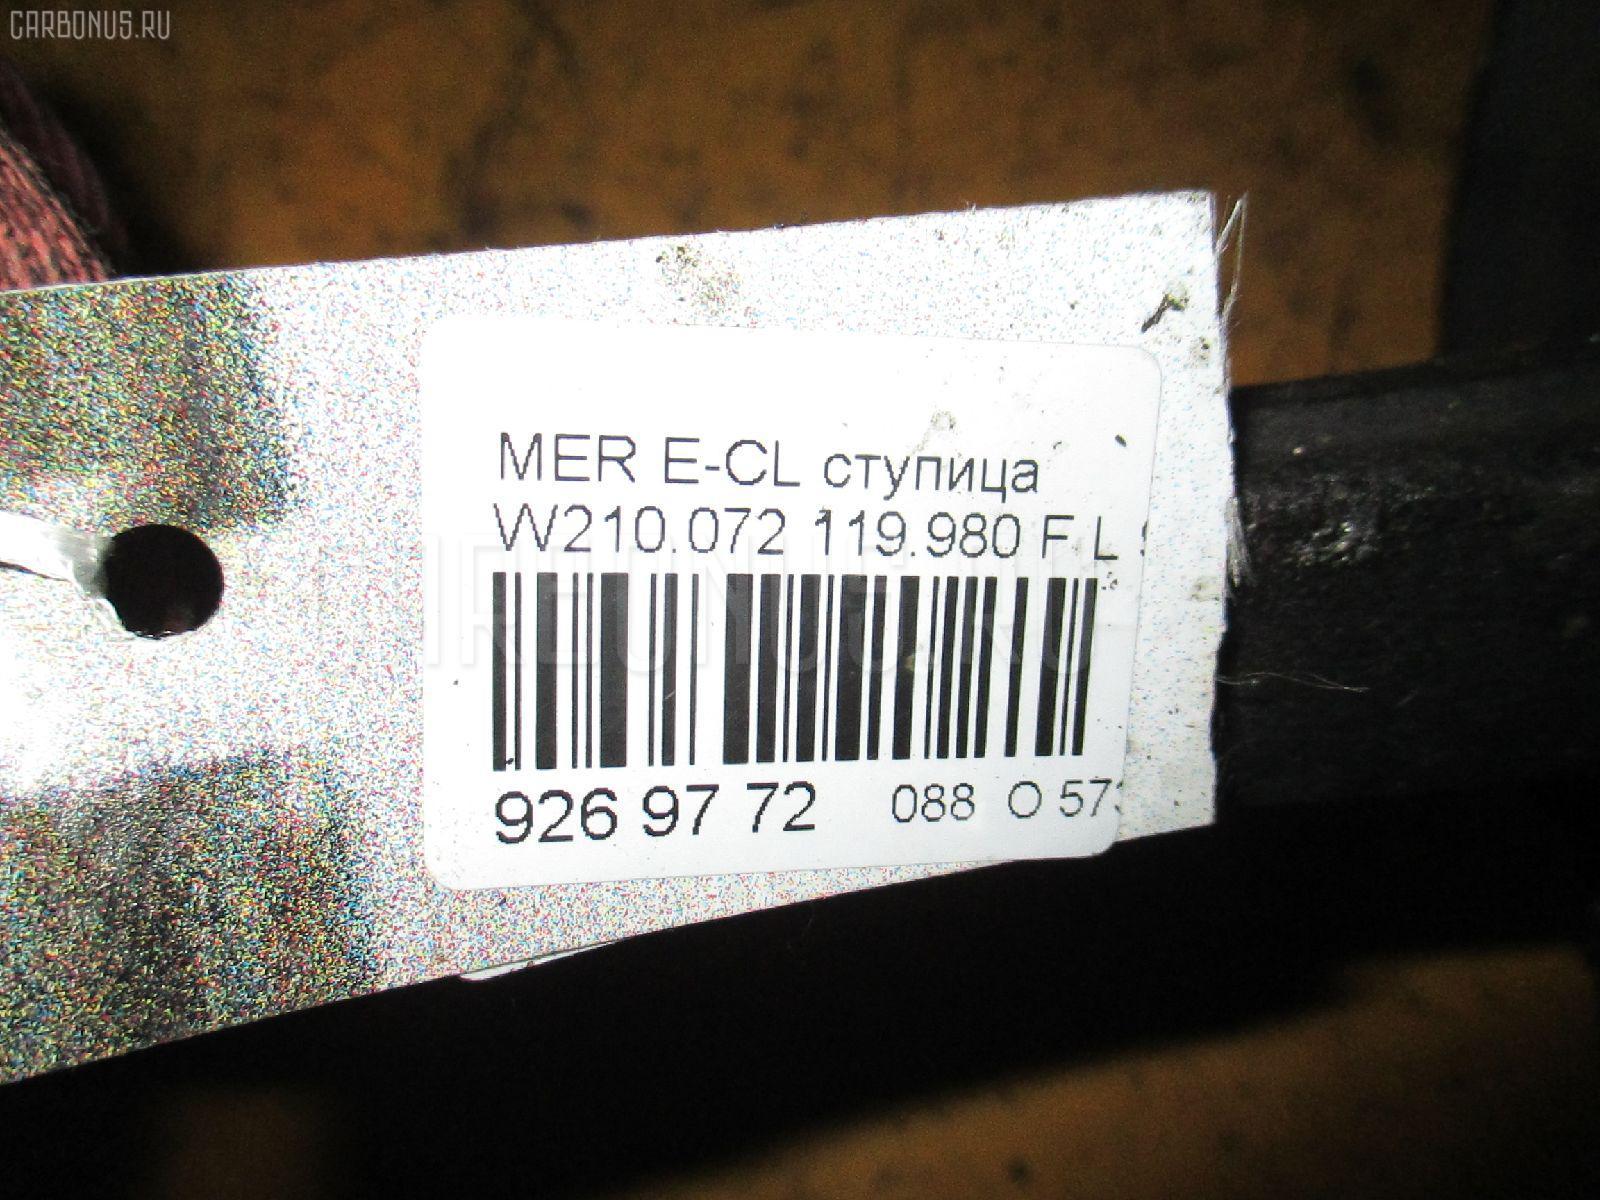 Ступица MERCEDES-BENZ E-CLASS W210.072 119.980 Фото 9